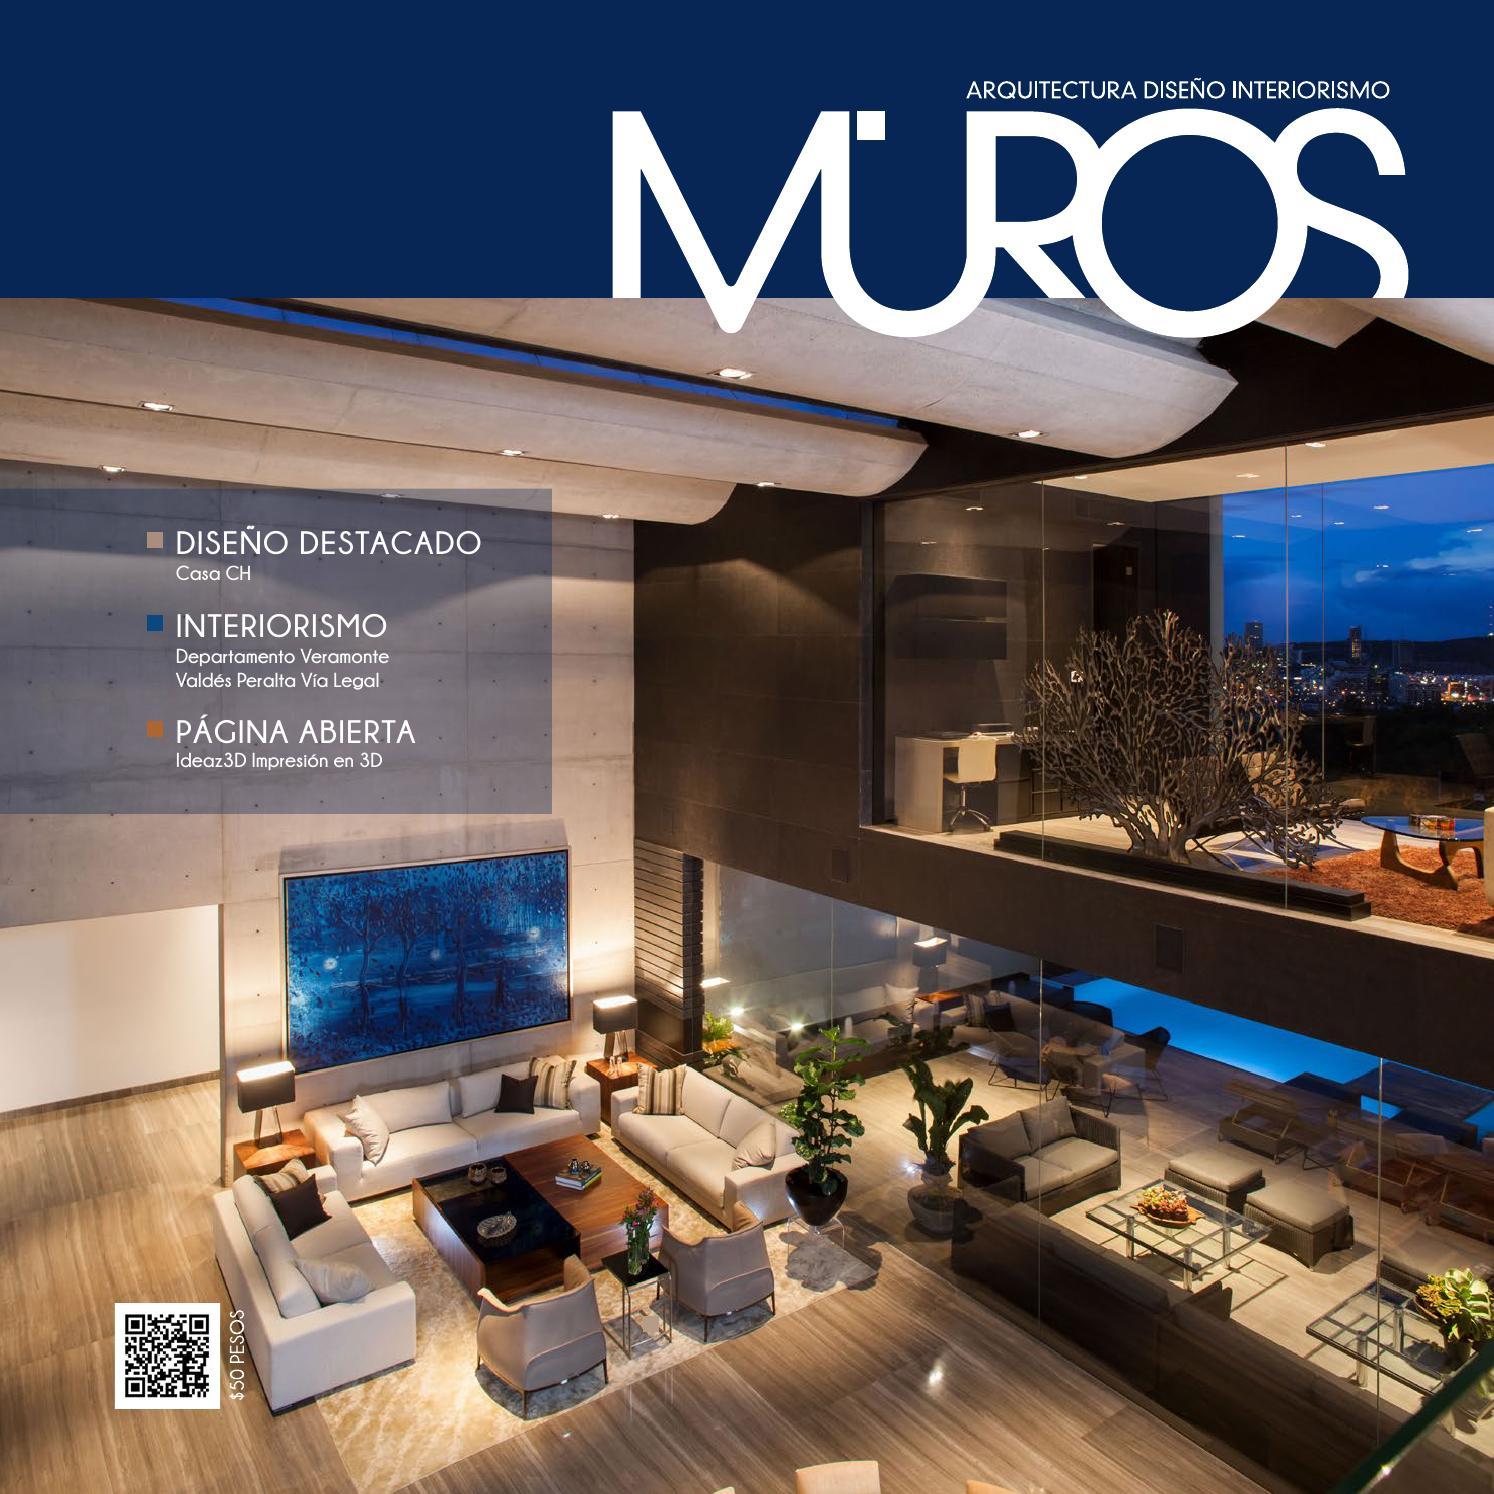 Edici n 8 revista muros arquitectura dise o interiorismo Arte arquitectura y diseno definicion